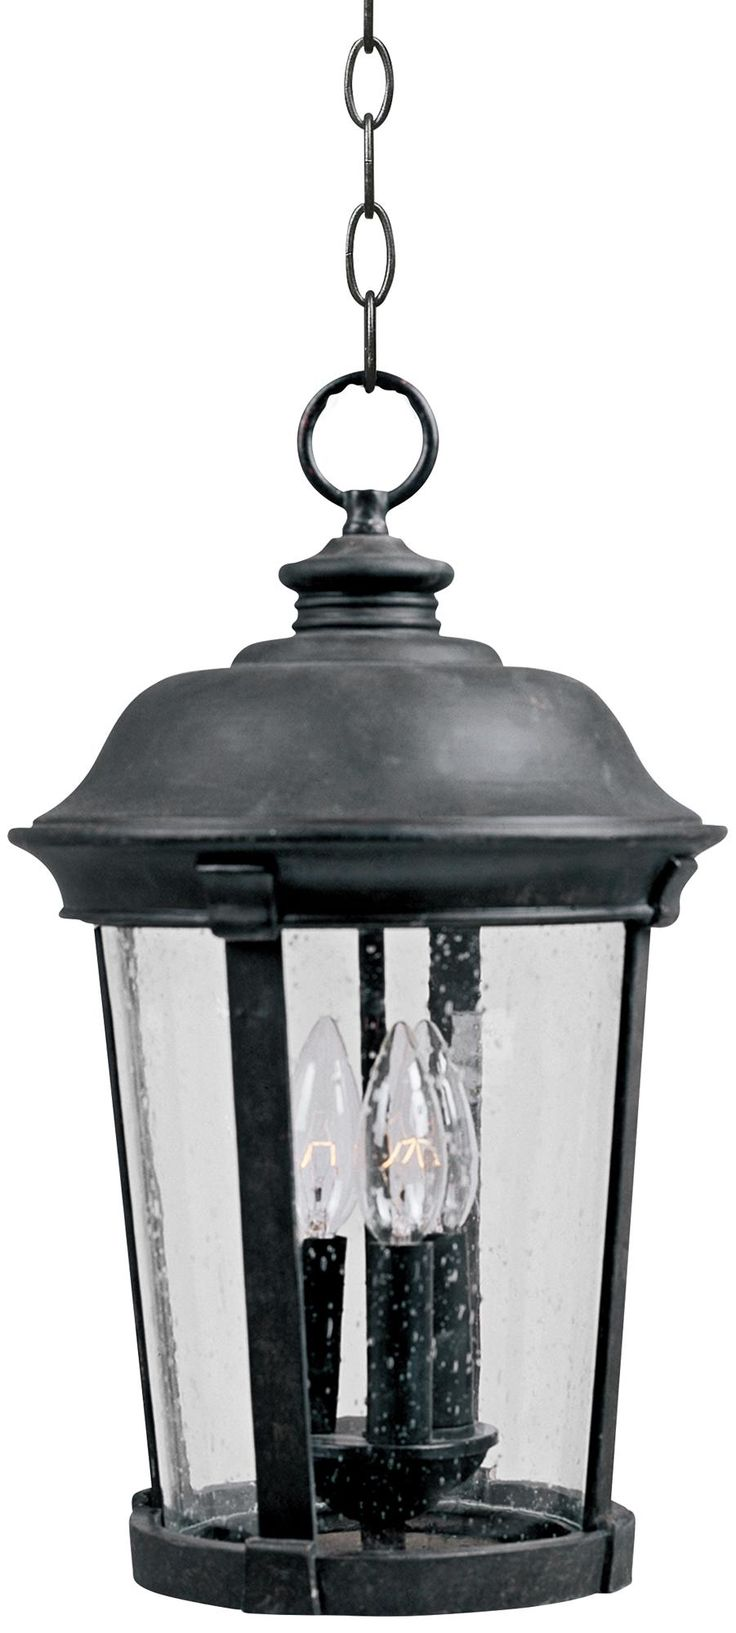 1000 Ideas About Outdoor Hanging Lanterns On Pinterest Glass Lanterns Mor